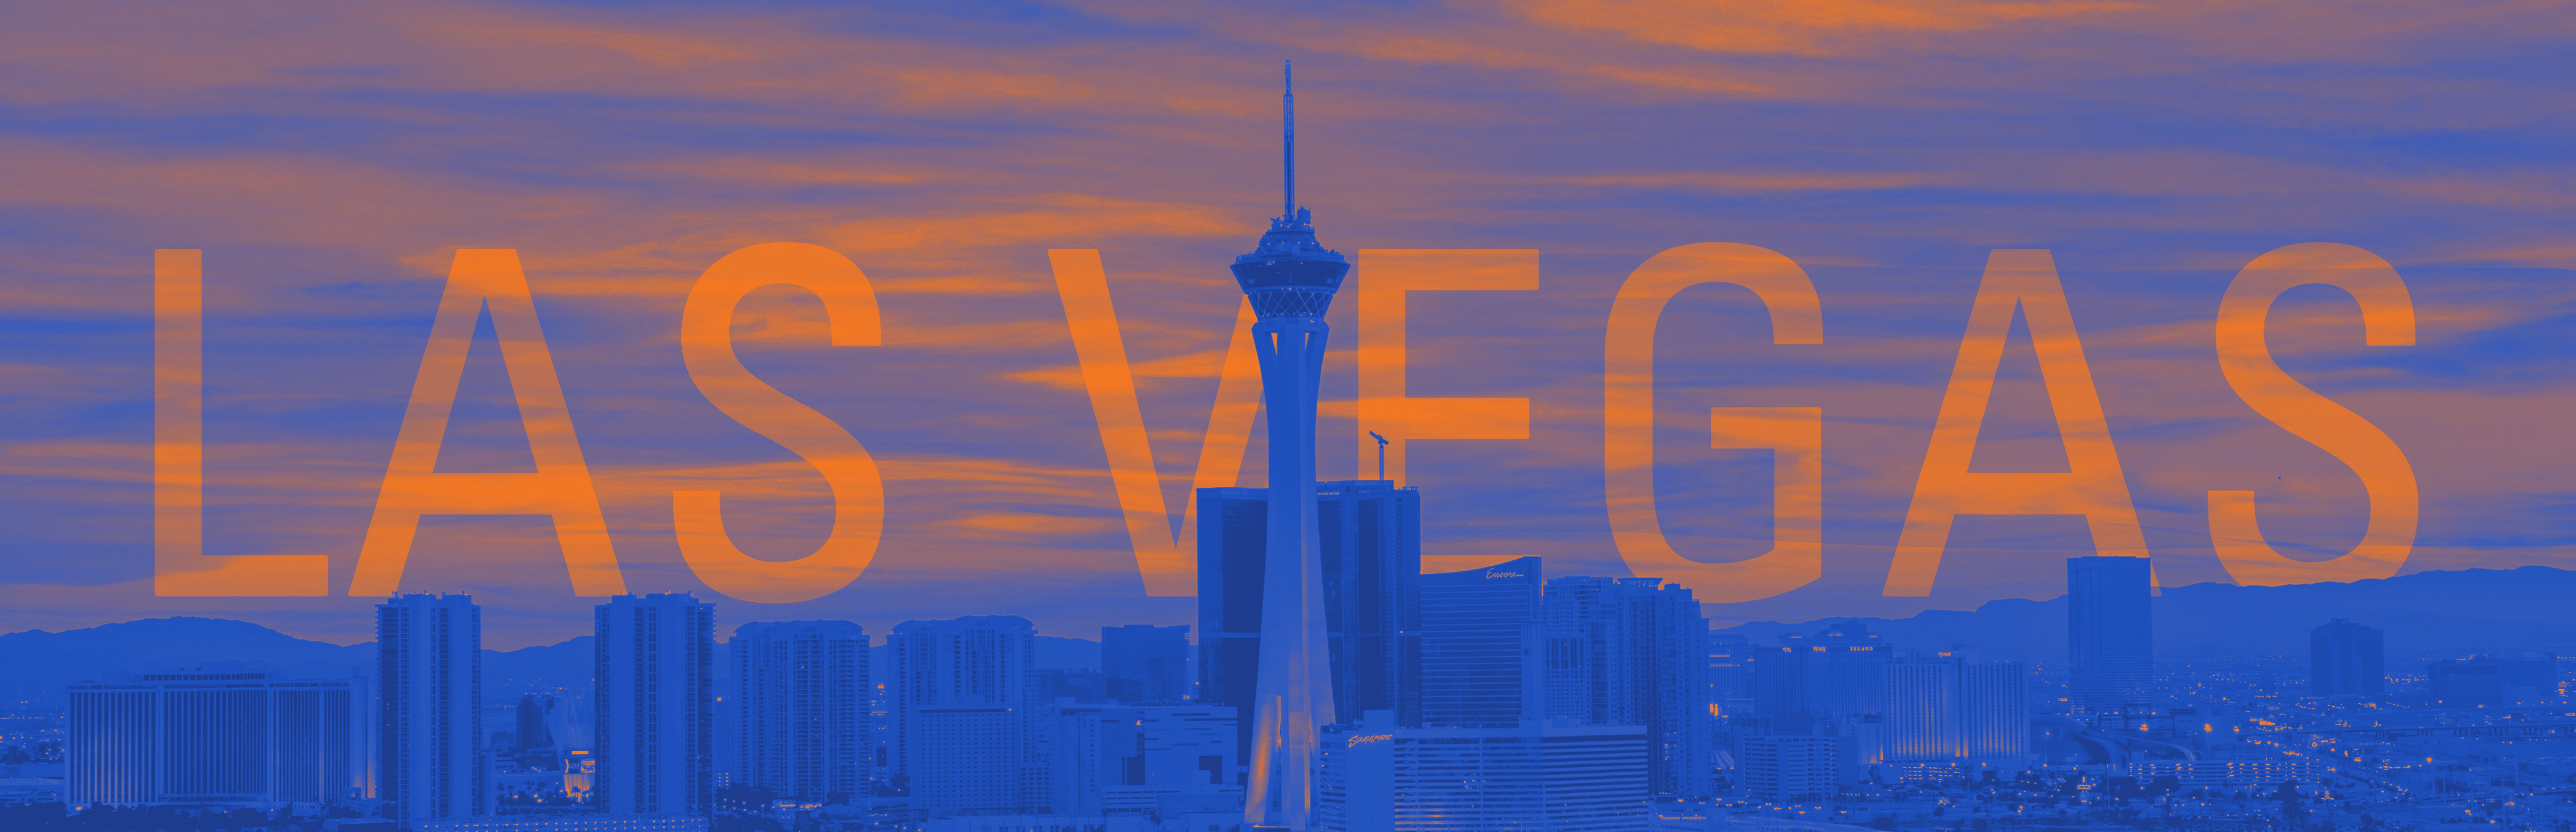 Las Vegas, NV - Lewis Brisbois Bisgaard & Smith LLP